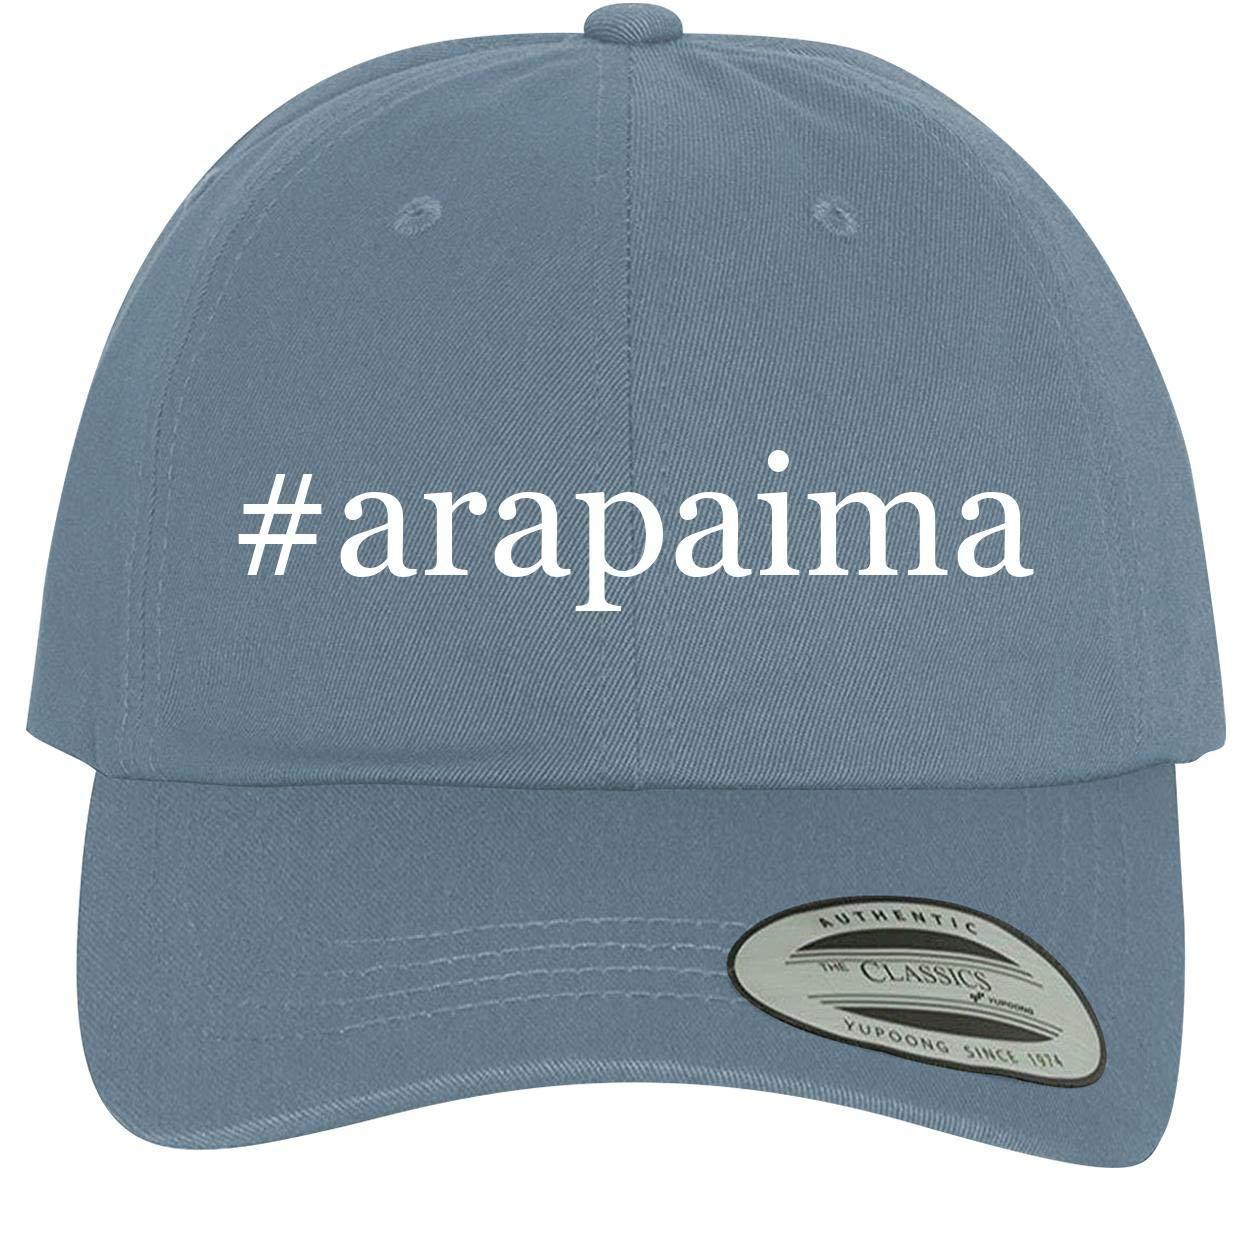 Comfortable Dad Hat Baseball Cap BH Cool Designs #Arapaima